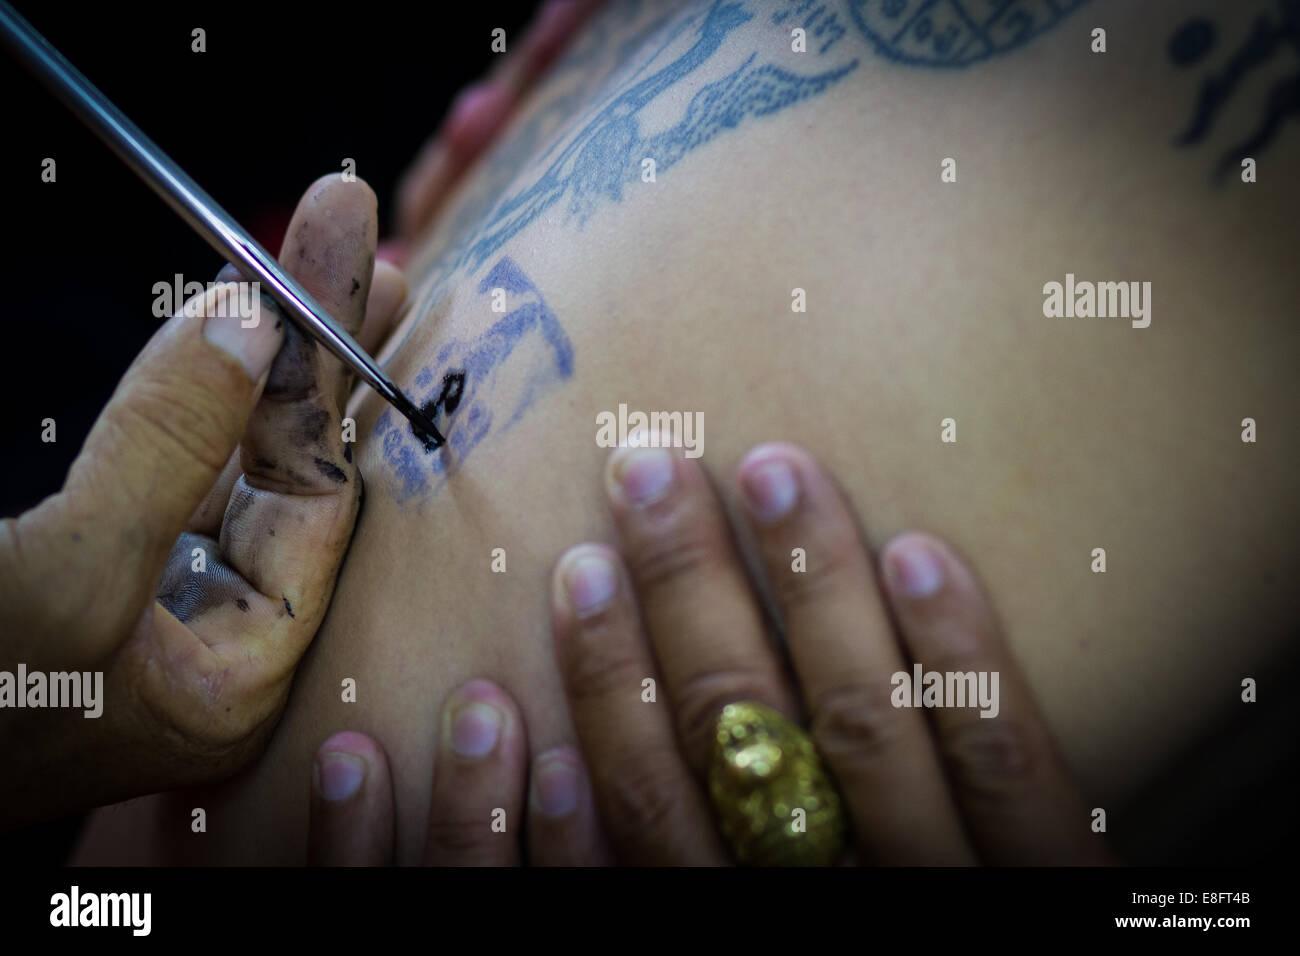 Tailandia, Provincia Samut Prakan Provincia, Sak Yant, Festival donde los monjes devotos de tatuaje Imagen De Stock